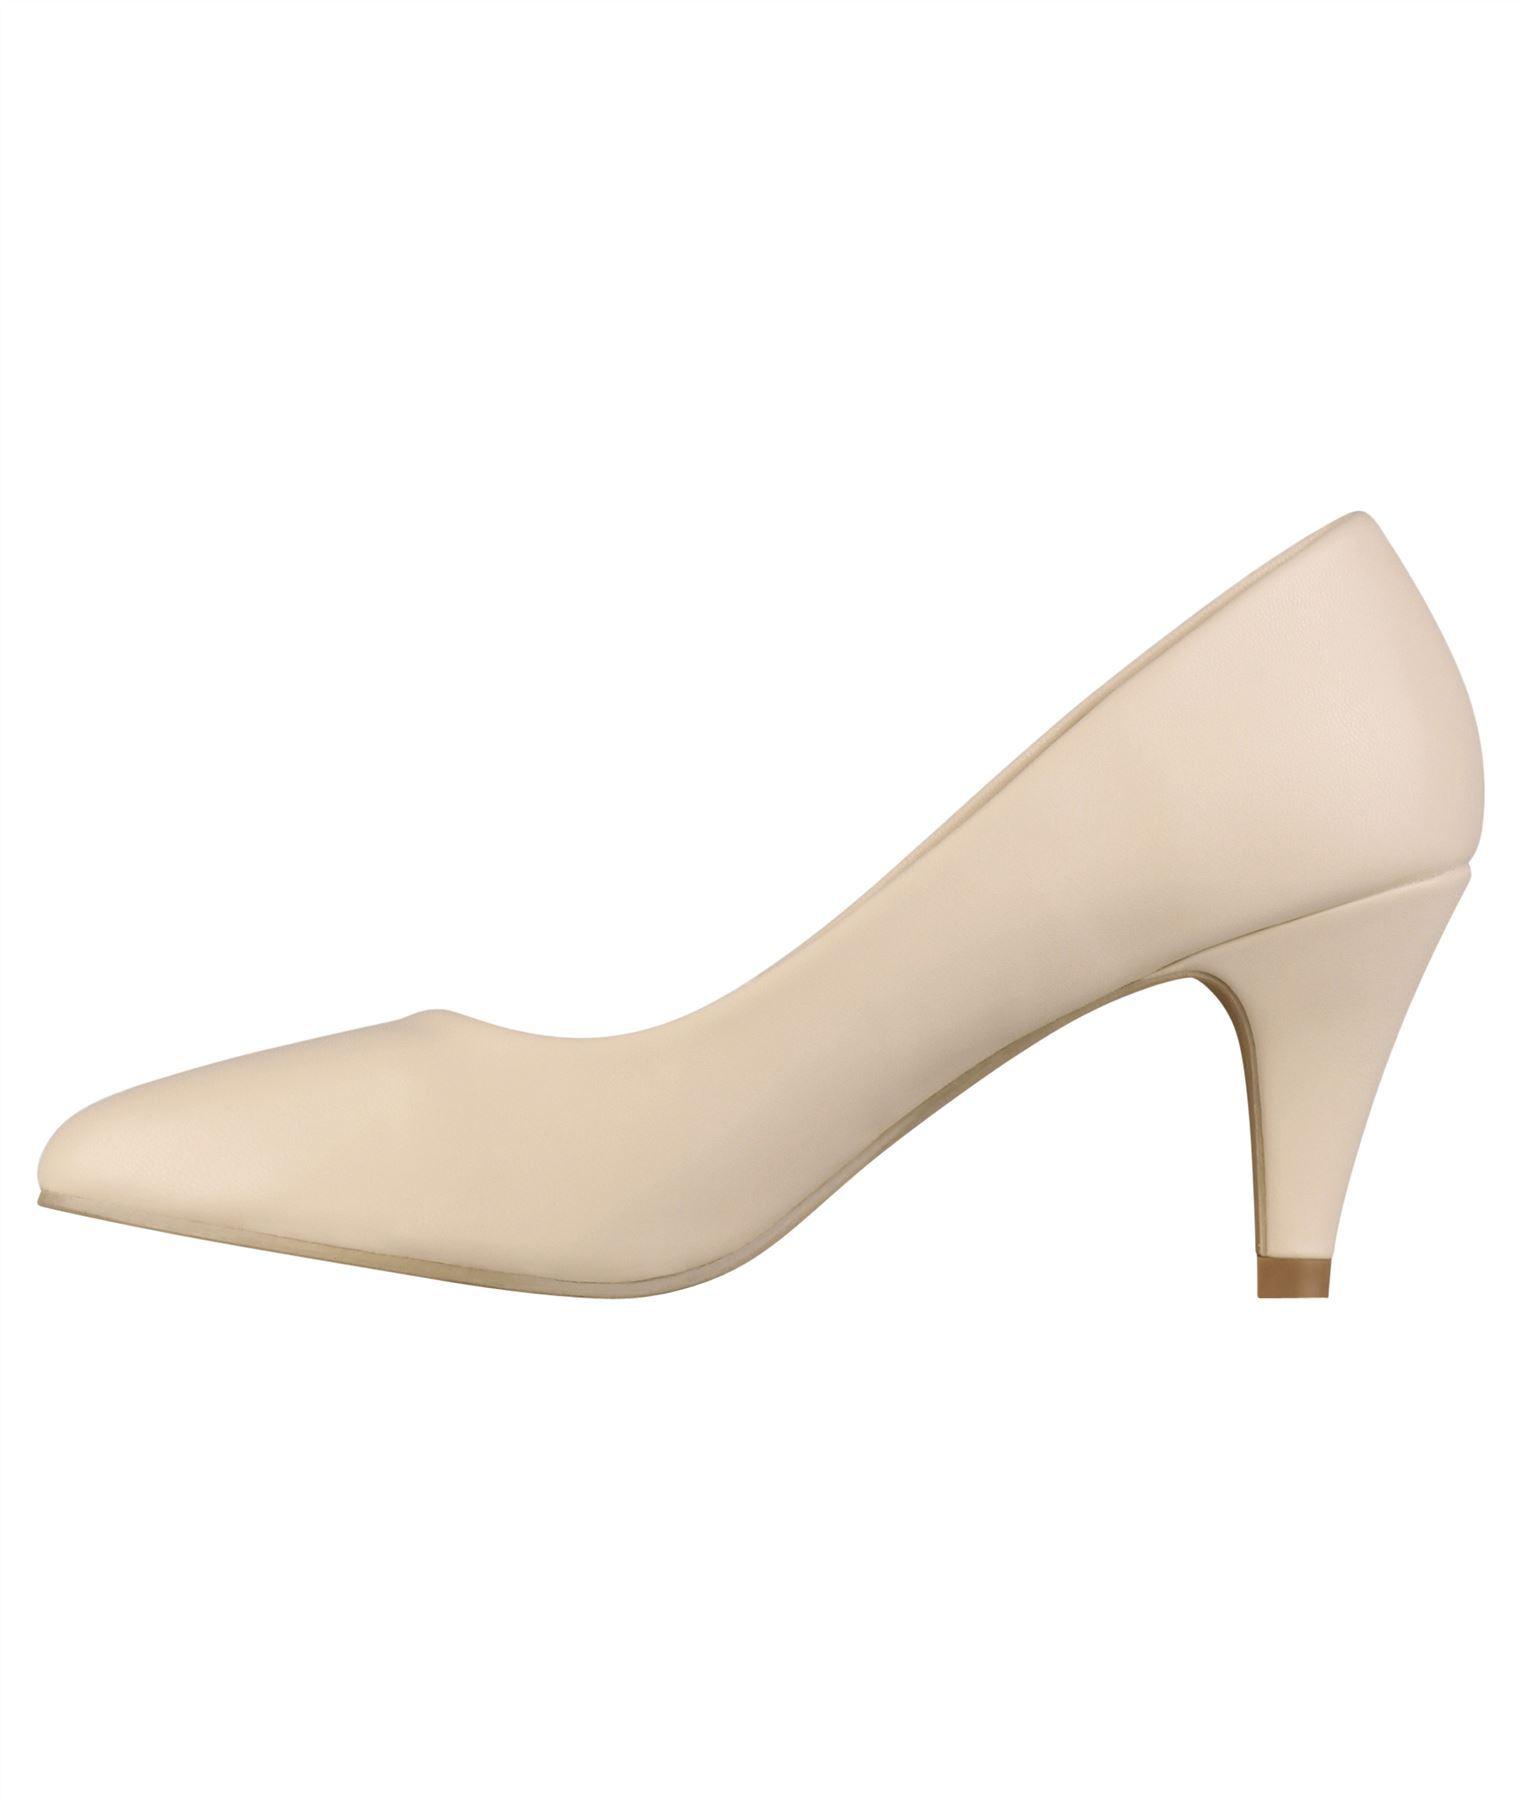 Womens-Ladies-Mid-Heel-Court-Shoes-Slip-On-Low-Kitten-Heels-Pumps-Matte-Size-3-8 thumbnail 6